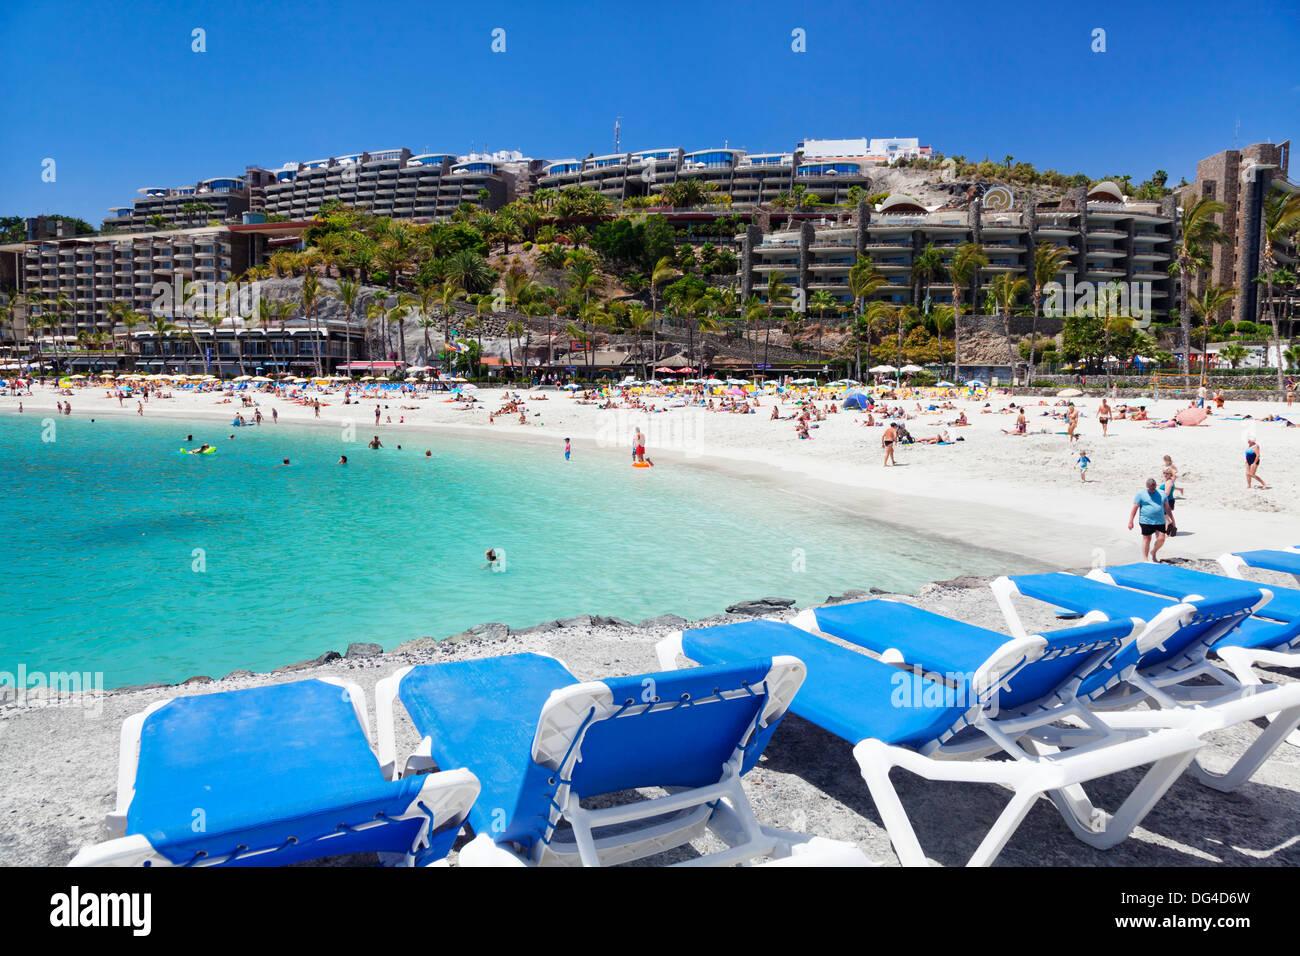 Sun loungers at a beach, Arguineguin, Anfi del Mar, Playa de la Verga, Gran Canaria, Canary Islands, Spain, Atlantic, Europe - Stock Image